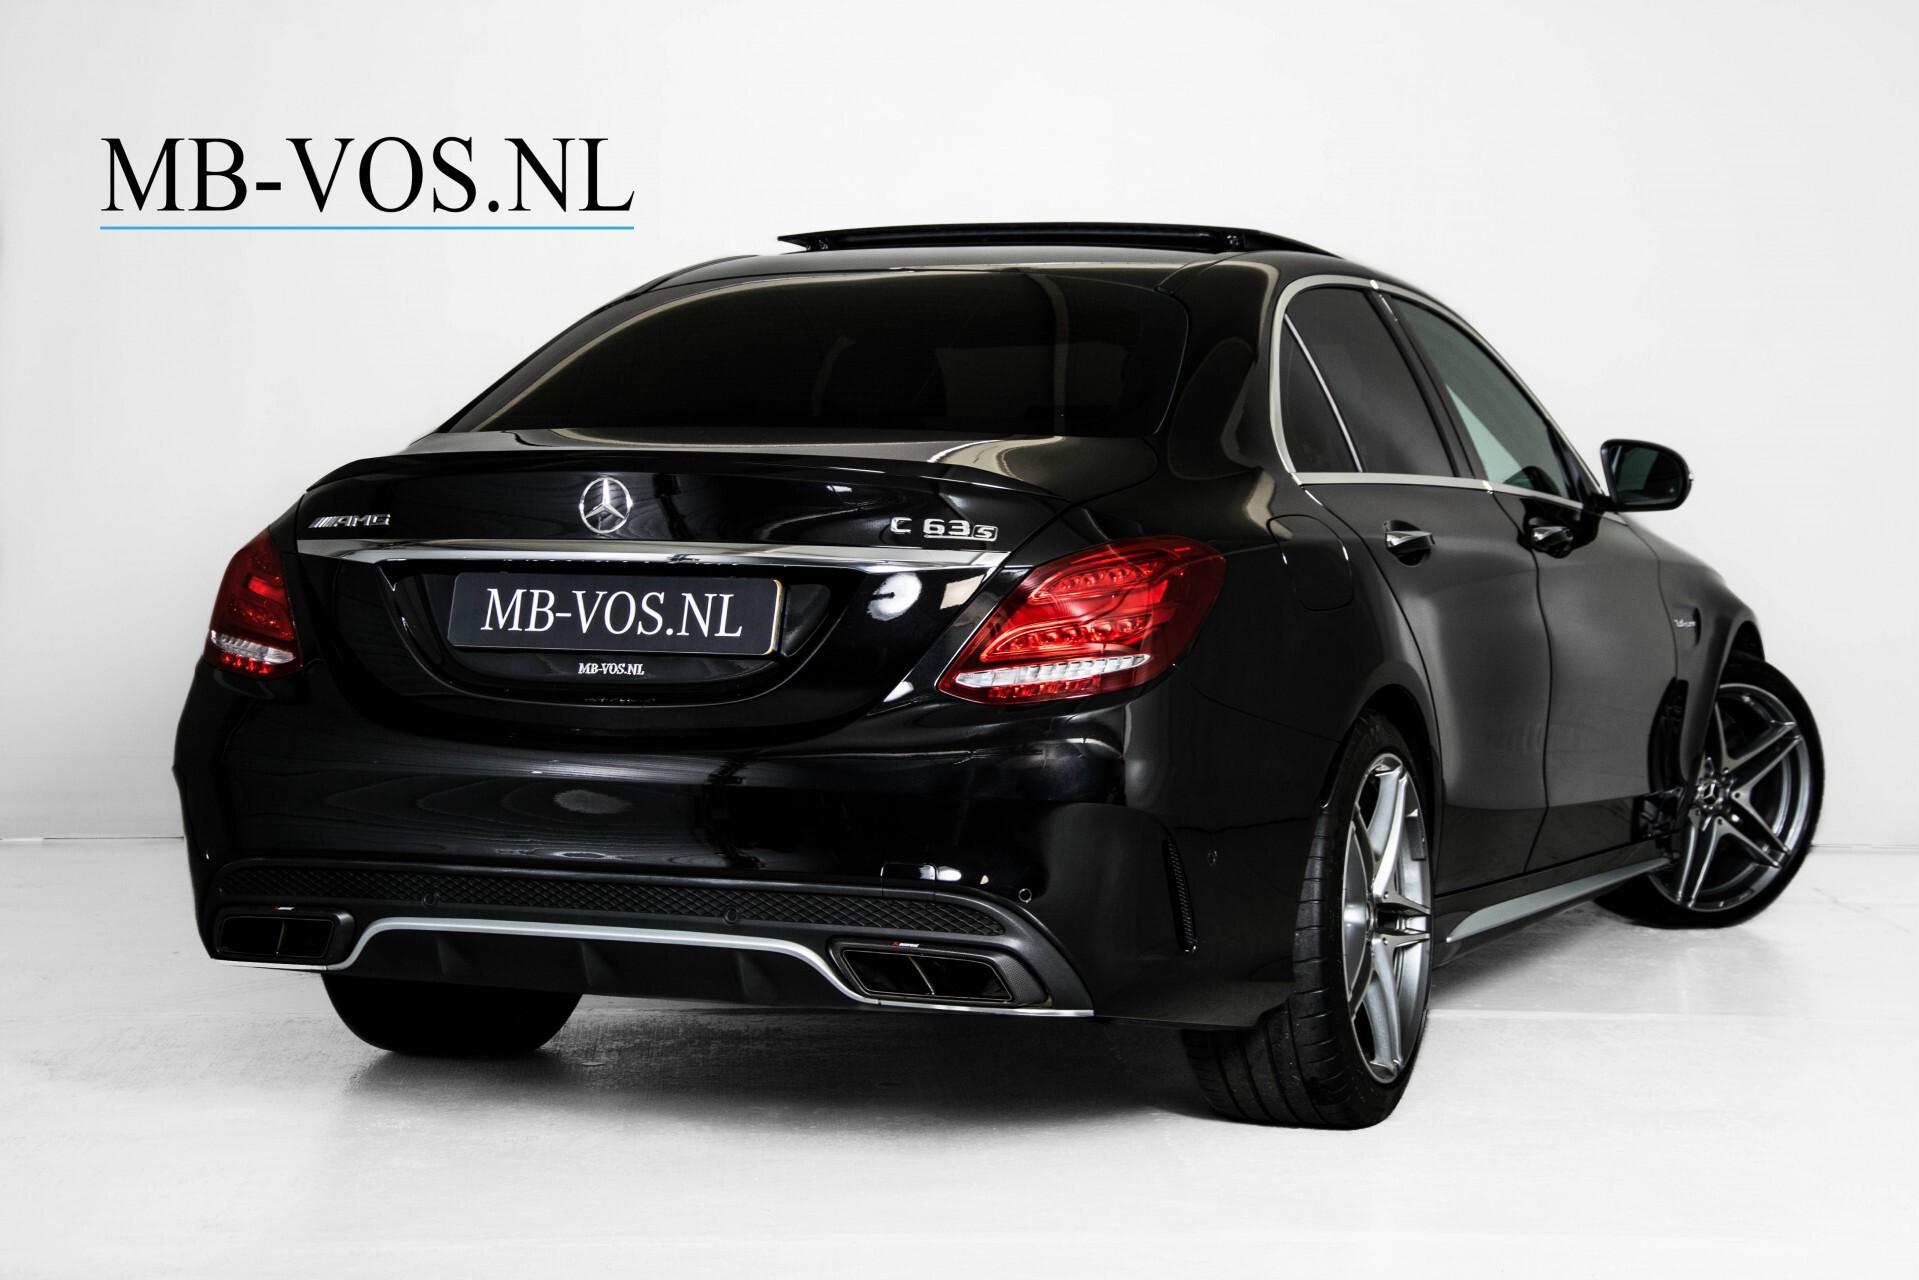 Mercedes-Benz C-Klasse 63 AMG S Panorama/Distronic/Keyless/Comand/Camera/ILS Aut7 Foto 2